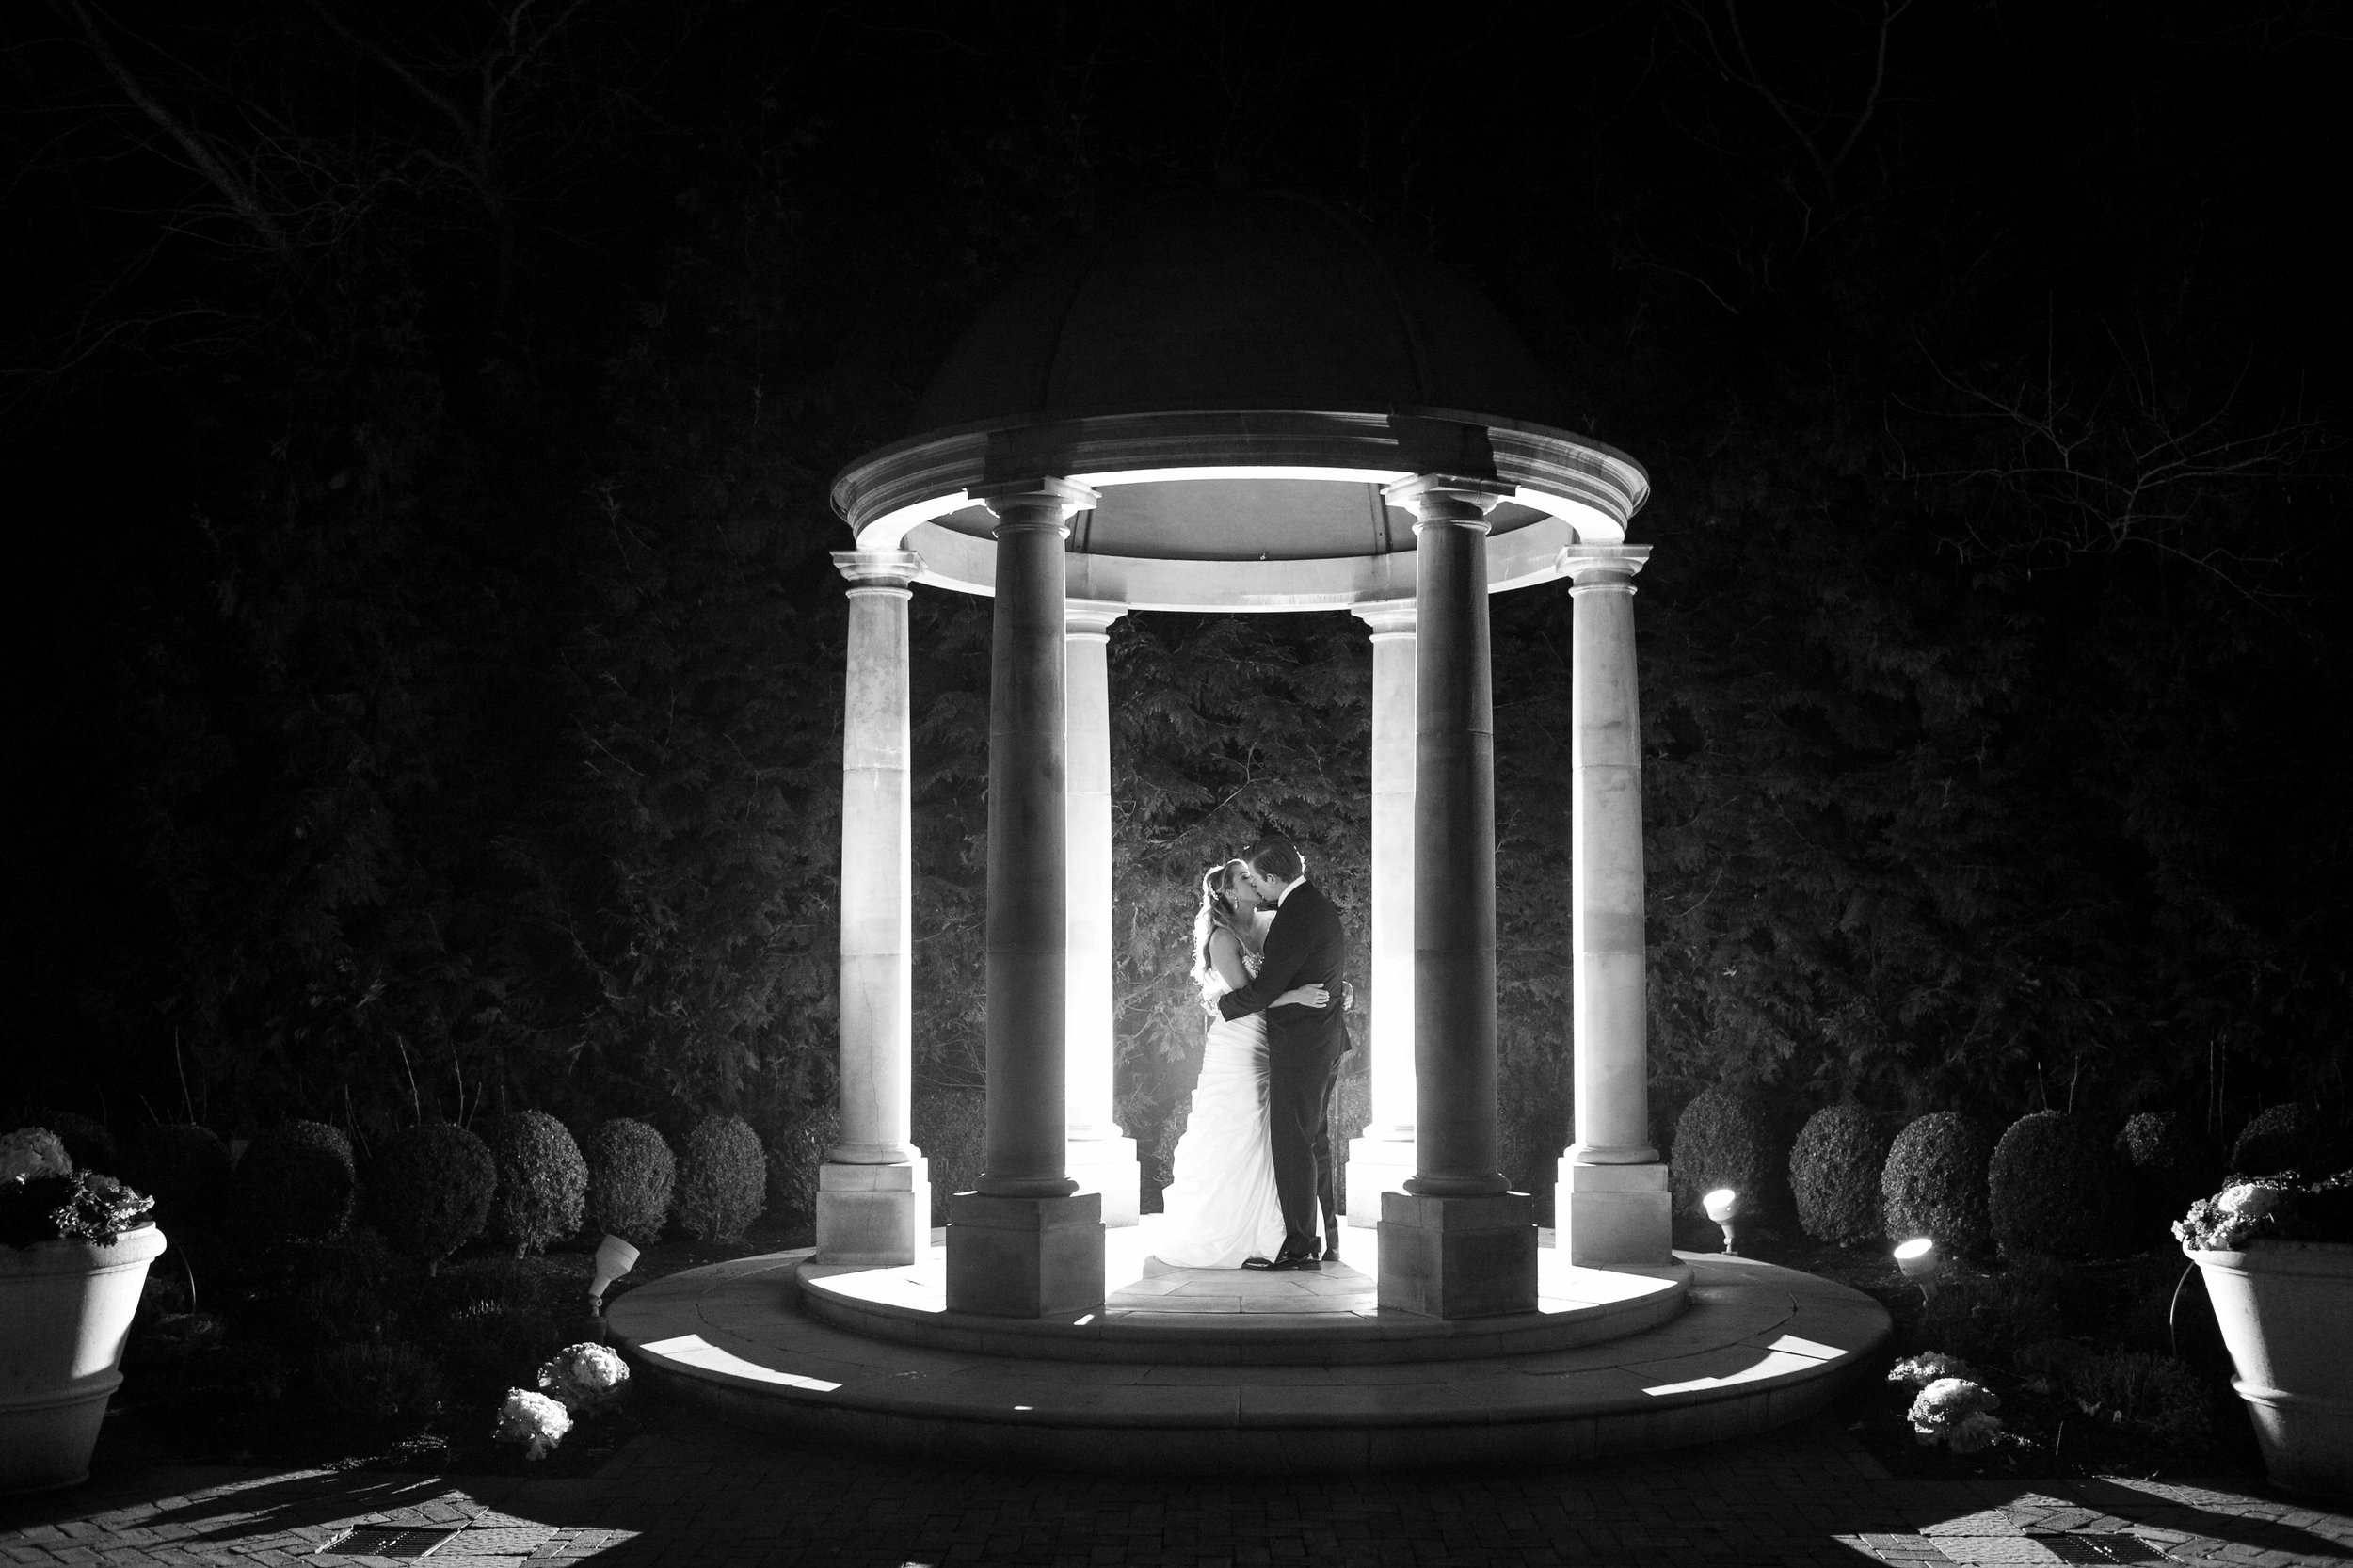 Ceci_New_York_Custom_Invitation_ New_Jersey_Wedding_Luxury_Personalized_Ceci_Style_Bride_Foil_Stamping173.JPG